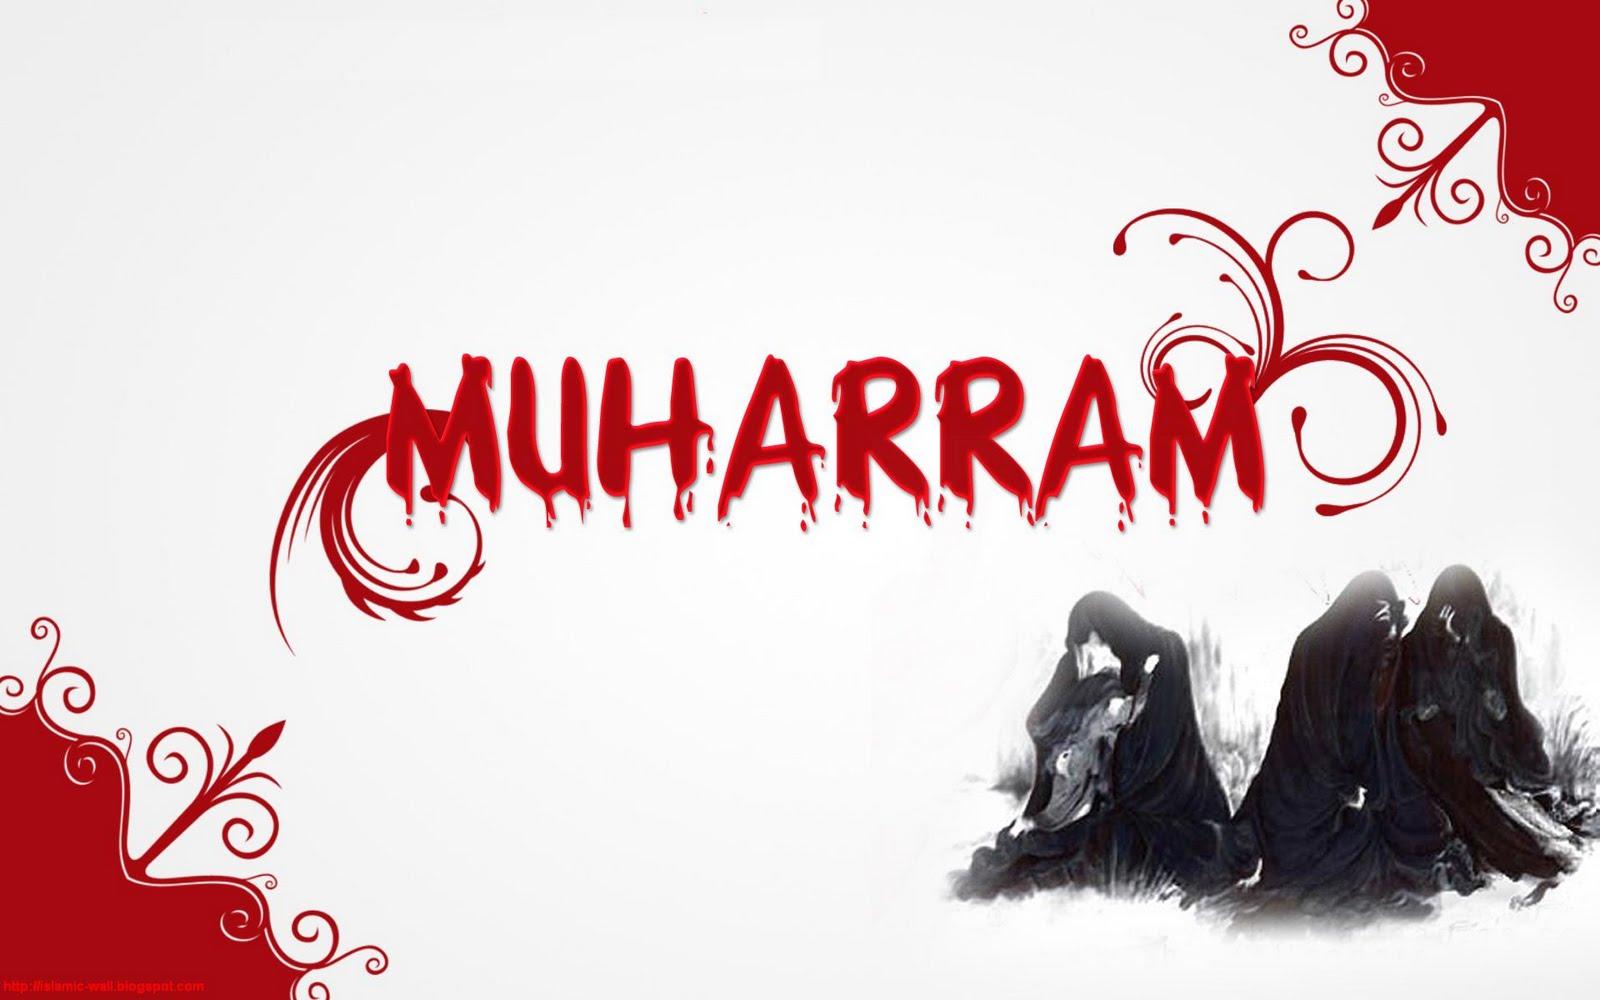 download free photos wallpapers muharram wallpaper 20122013